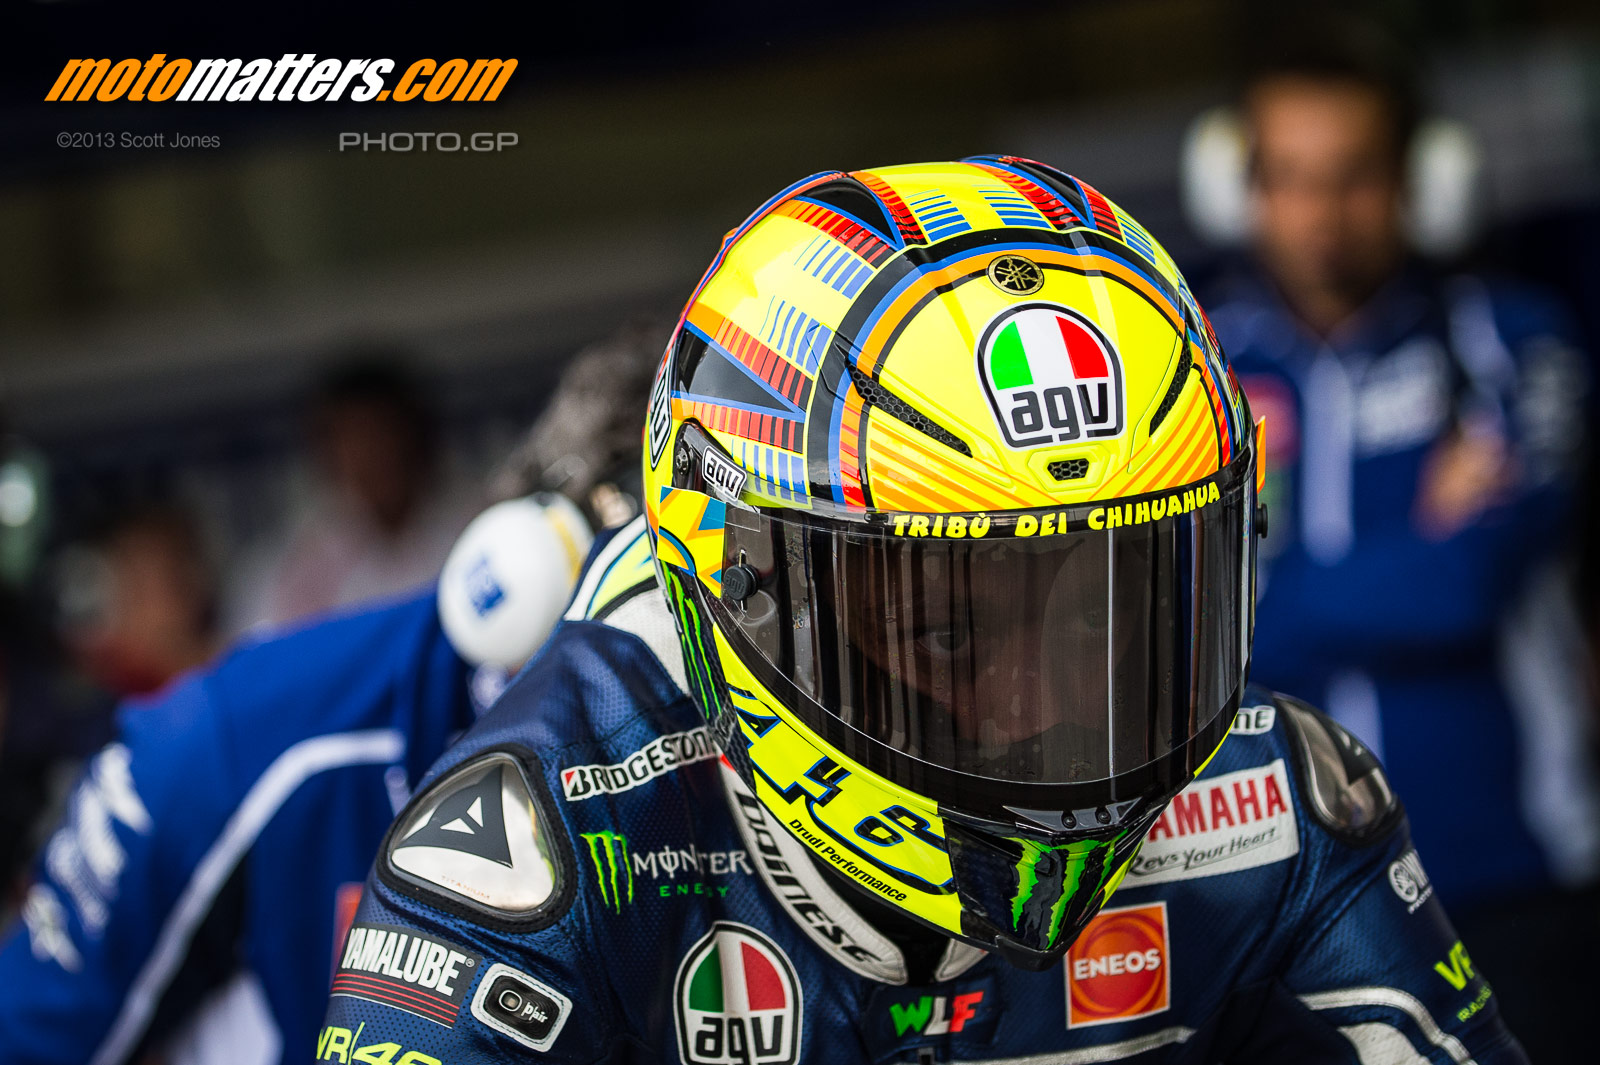 GP Sachsenring - Page 2 2013-MotoGP-08-Sachsenring-Saturday-0067-O